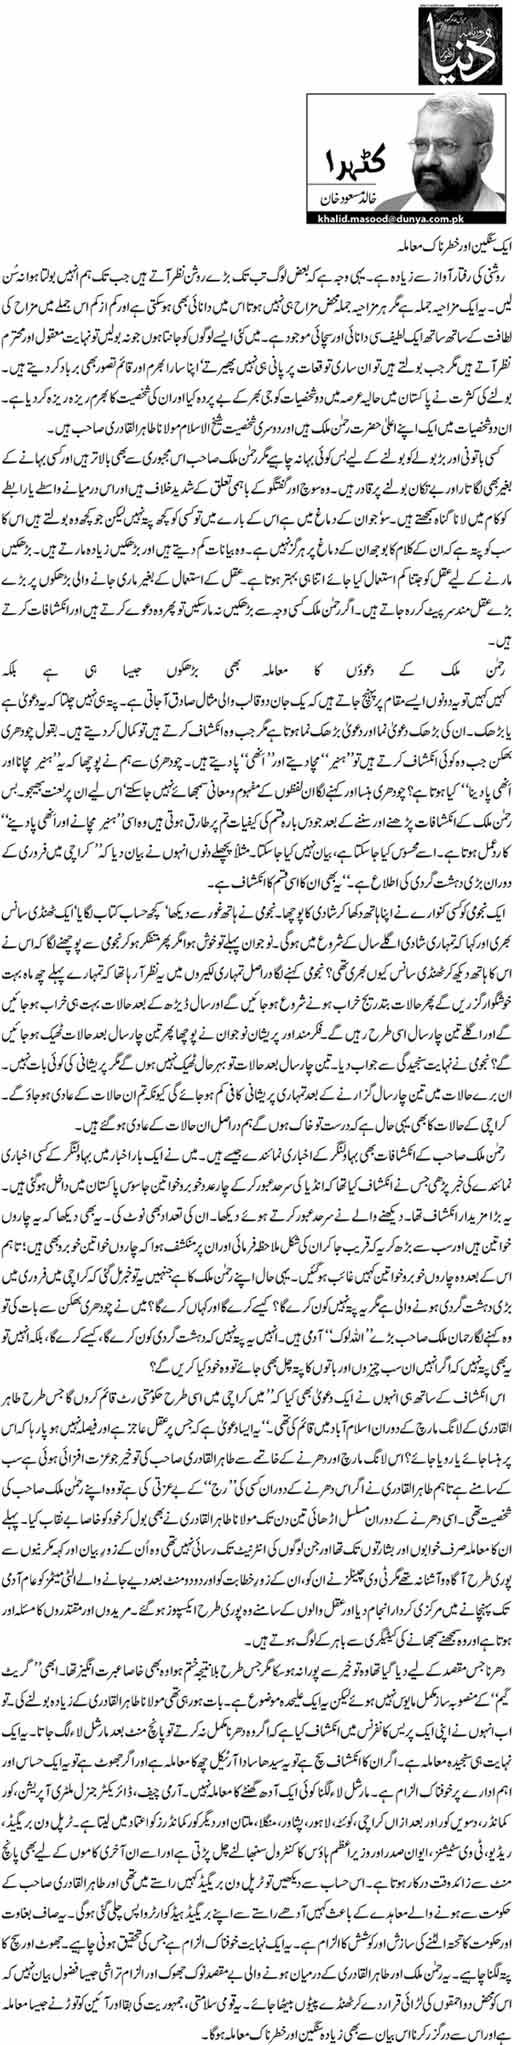 Aik sangeen aur khatarnaak muamla - Khalid Masood Khan